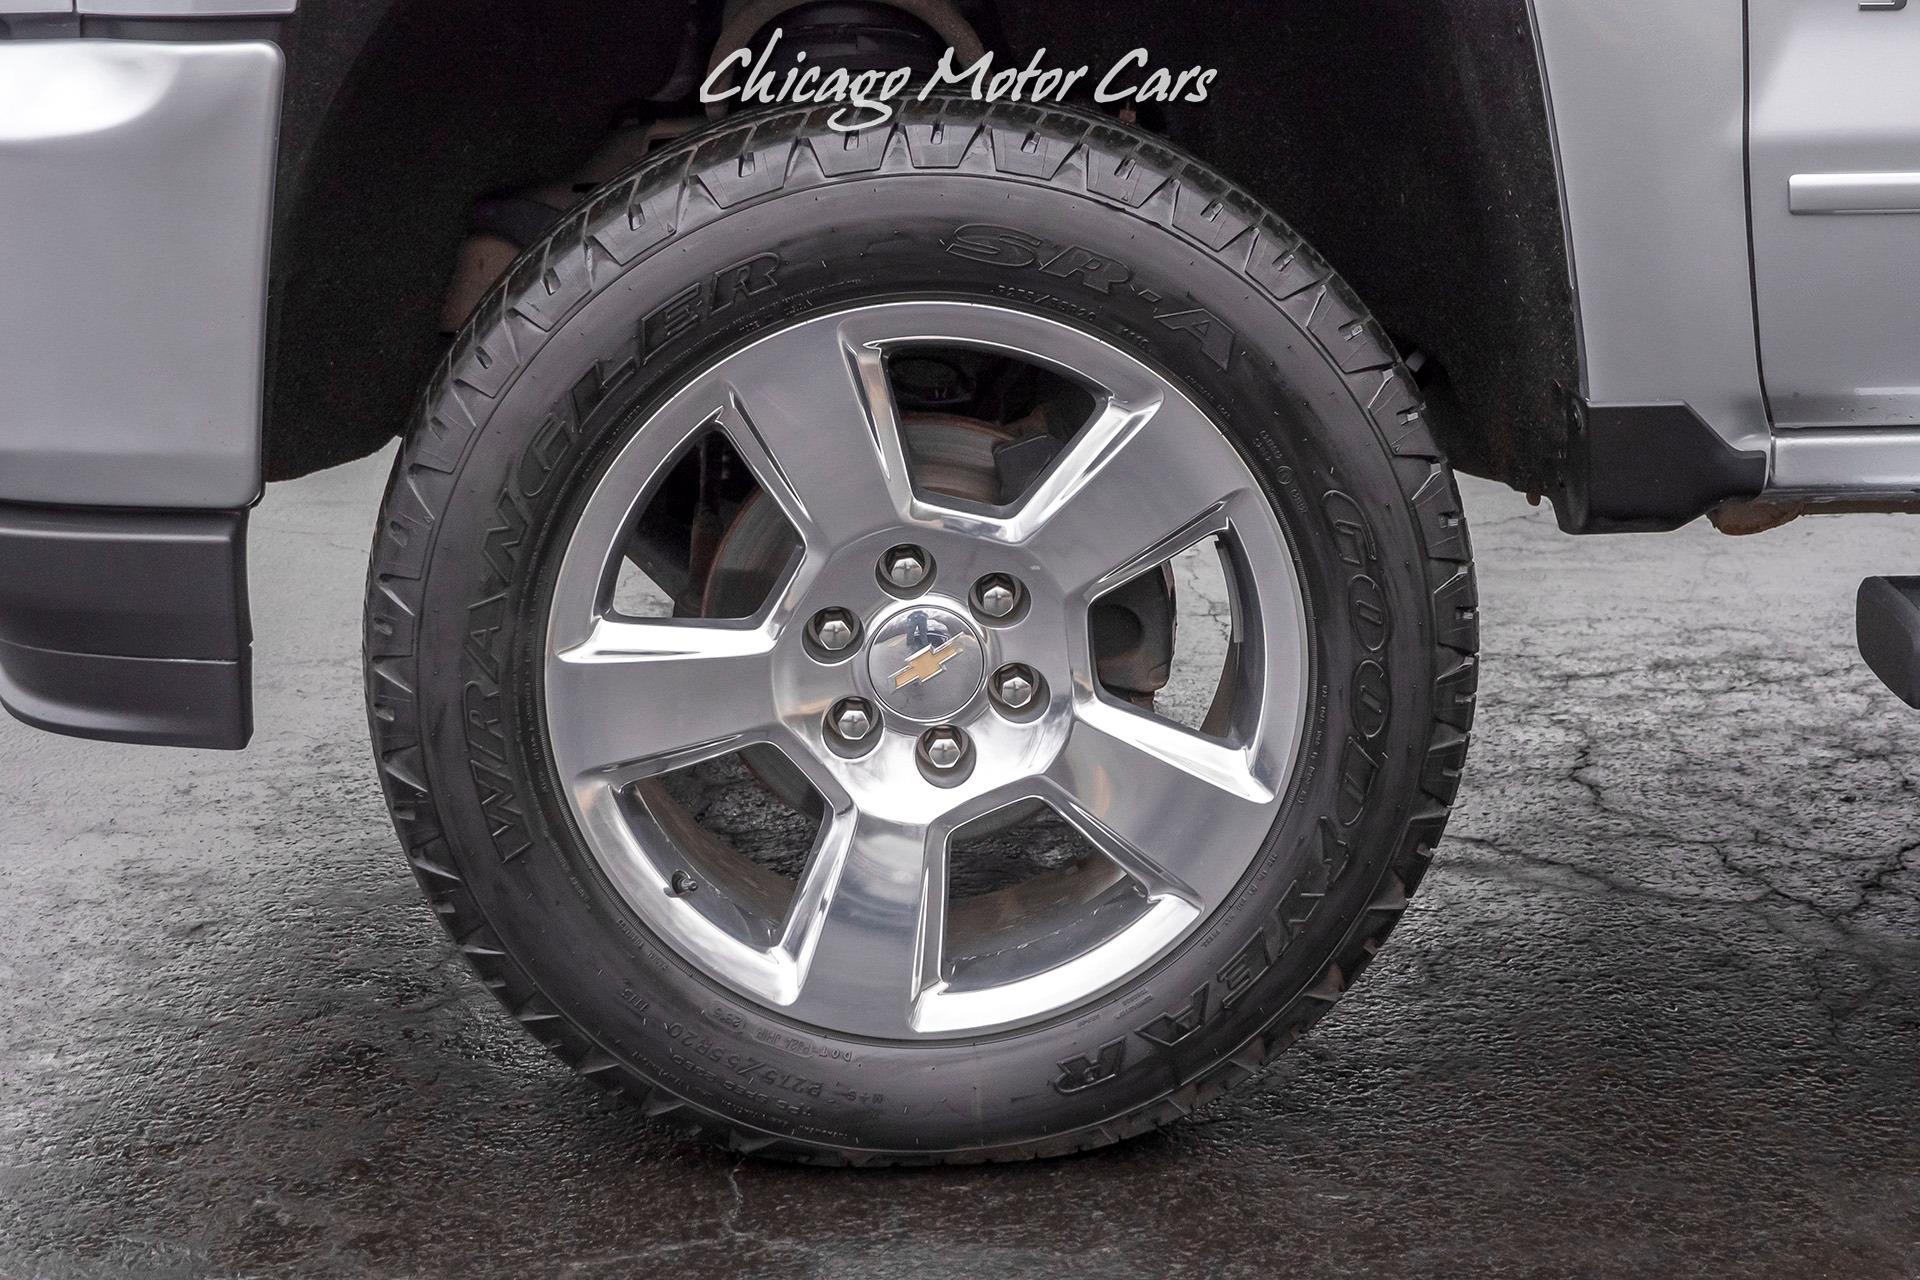 Used-2017-Chevrolet-Silverado-1500-Crew-Cab-Short-Bed-4WD-LT-Z71--LOADED-wOPTIONS